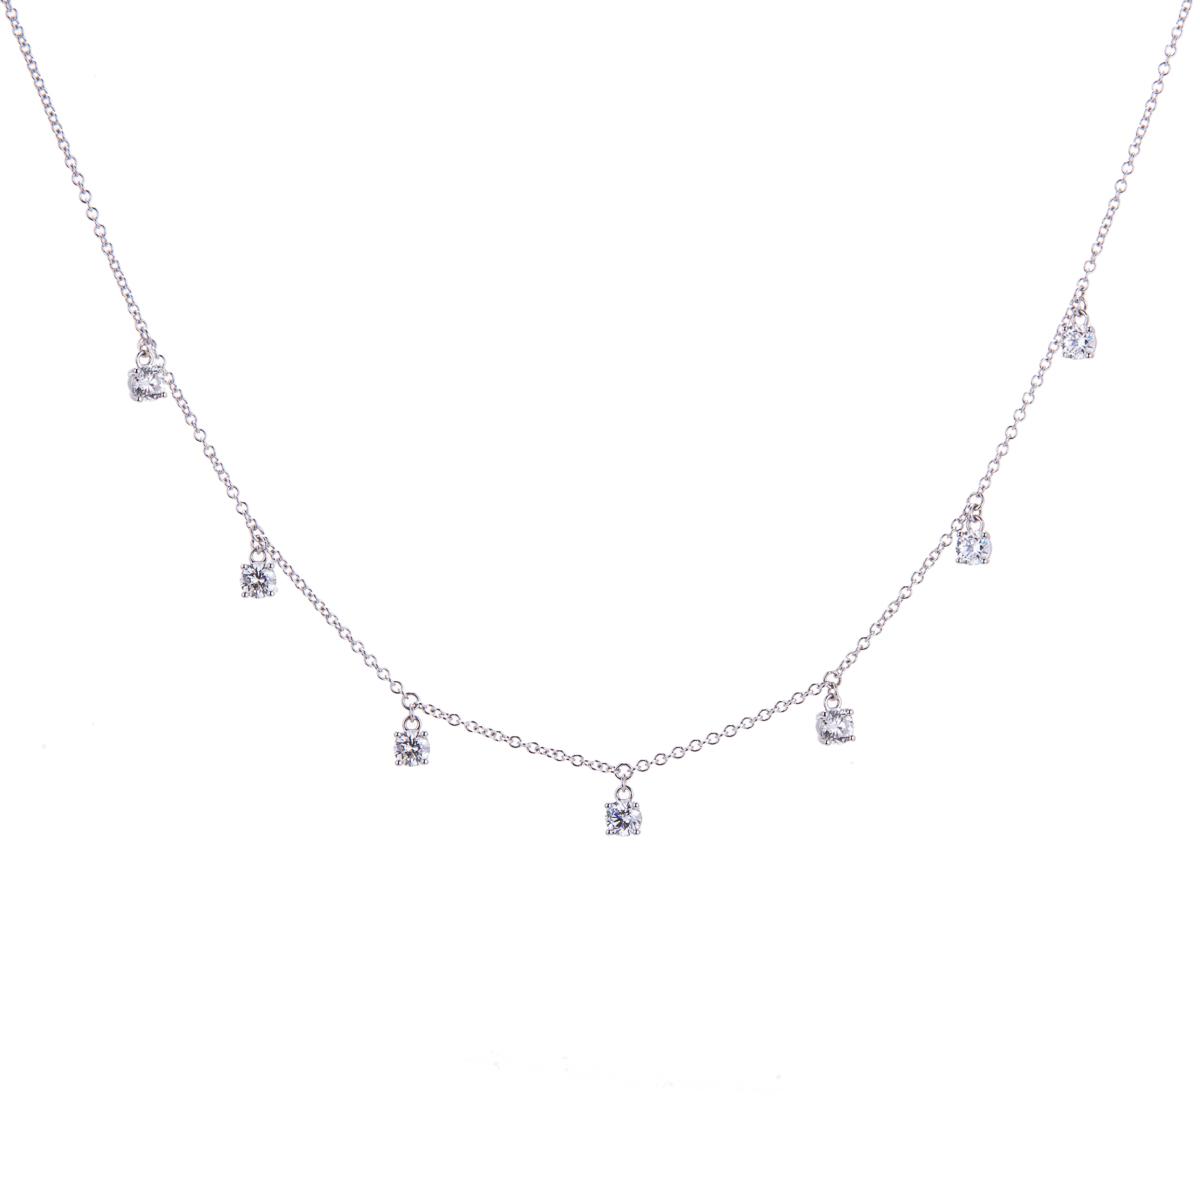 18ct-white-gold-diamond-necklace